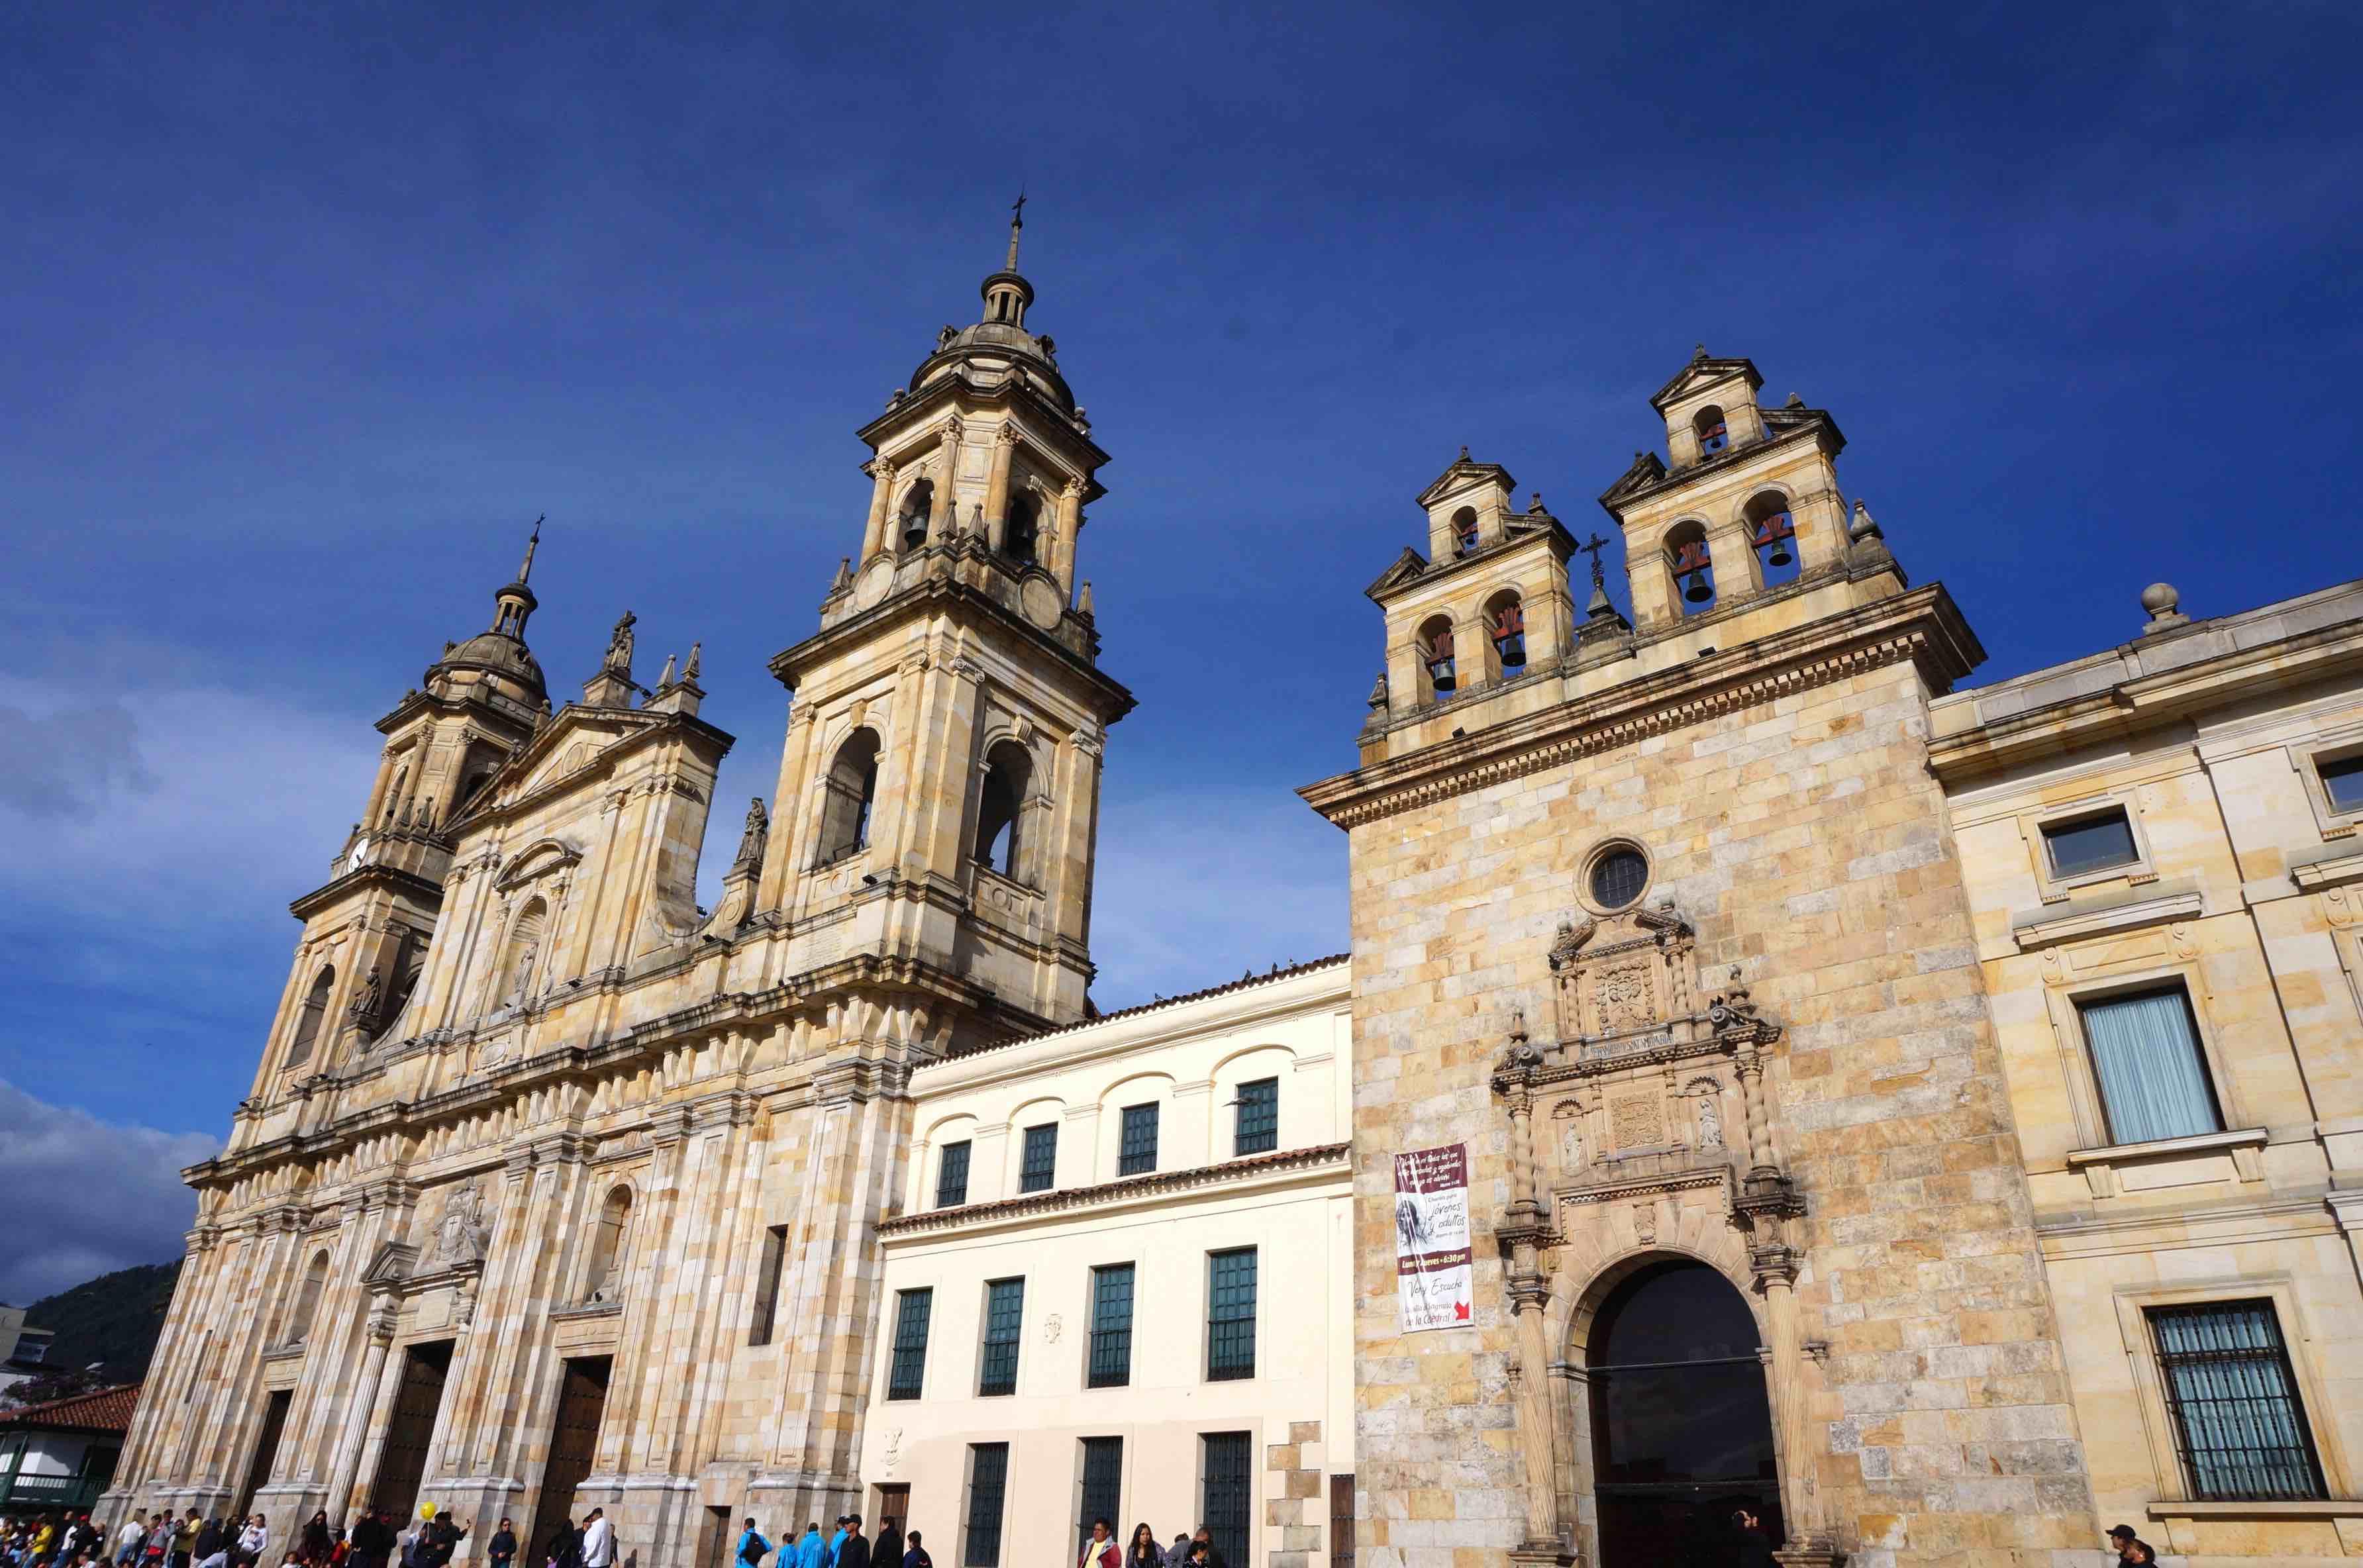 plaza bolivar, la candeleria, bogota, colombie